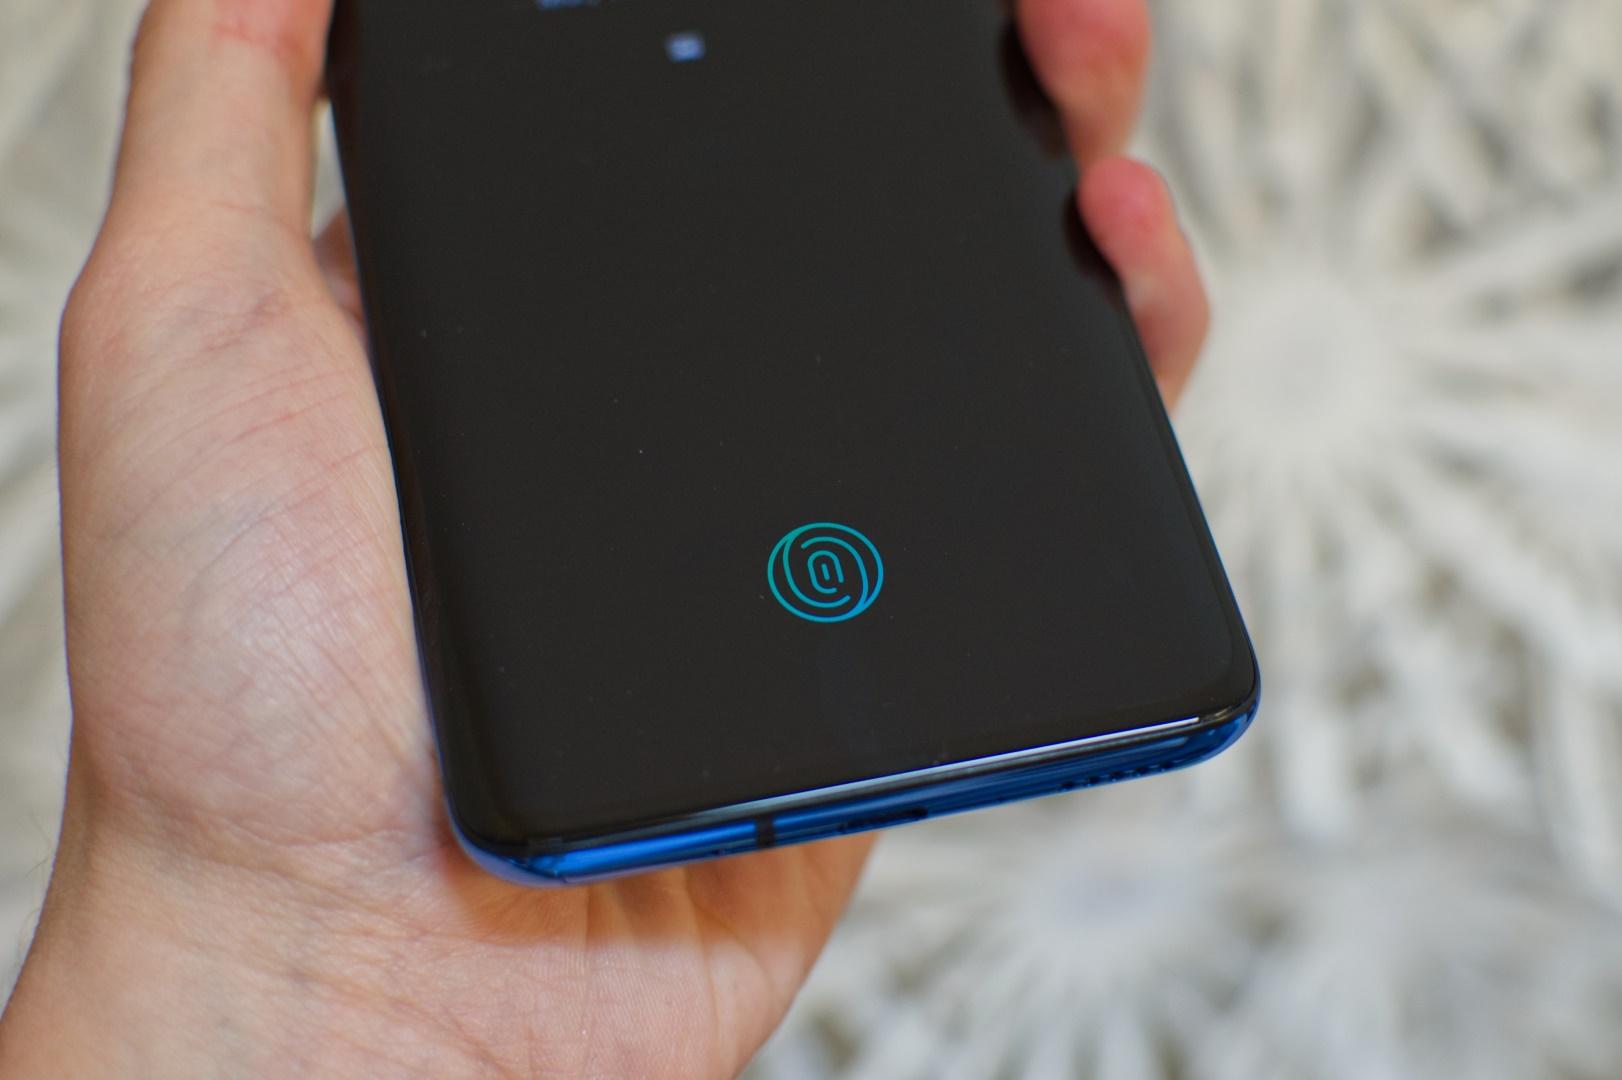 Bild des Fingerabdrucksensors des OnePlus 7 Pro. Image by Jonas Haller.